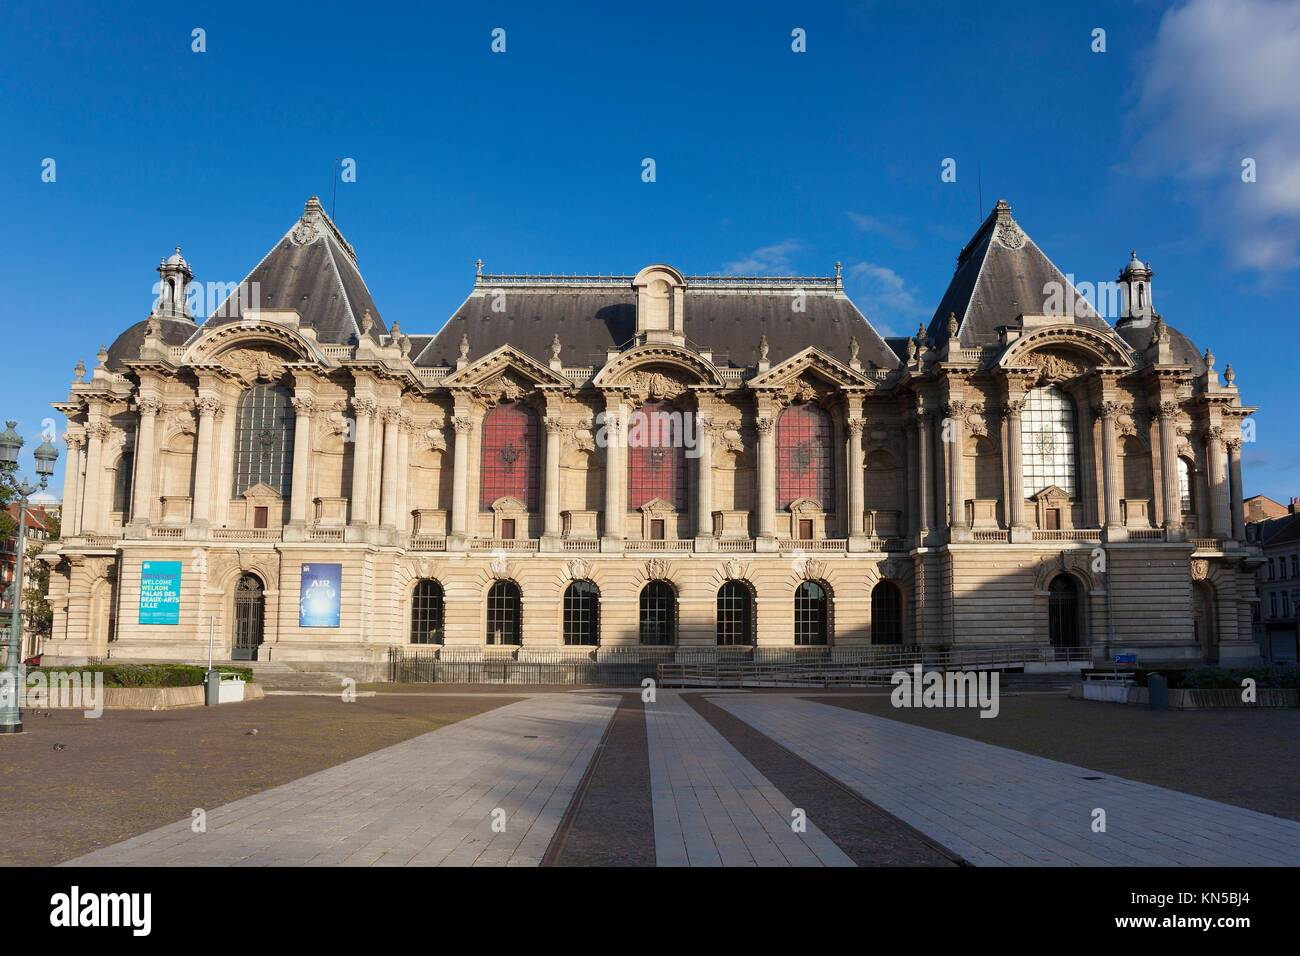 Museum of Fine Arts of Lille, Nord, Nord-Pas-de-Calais, France. - Stock Image